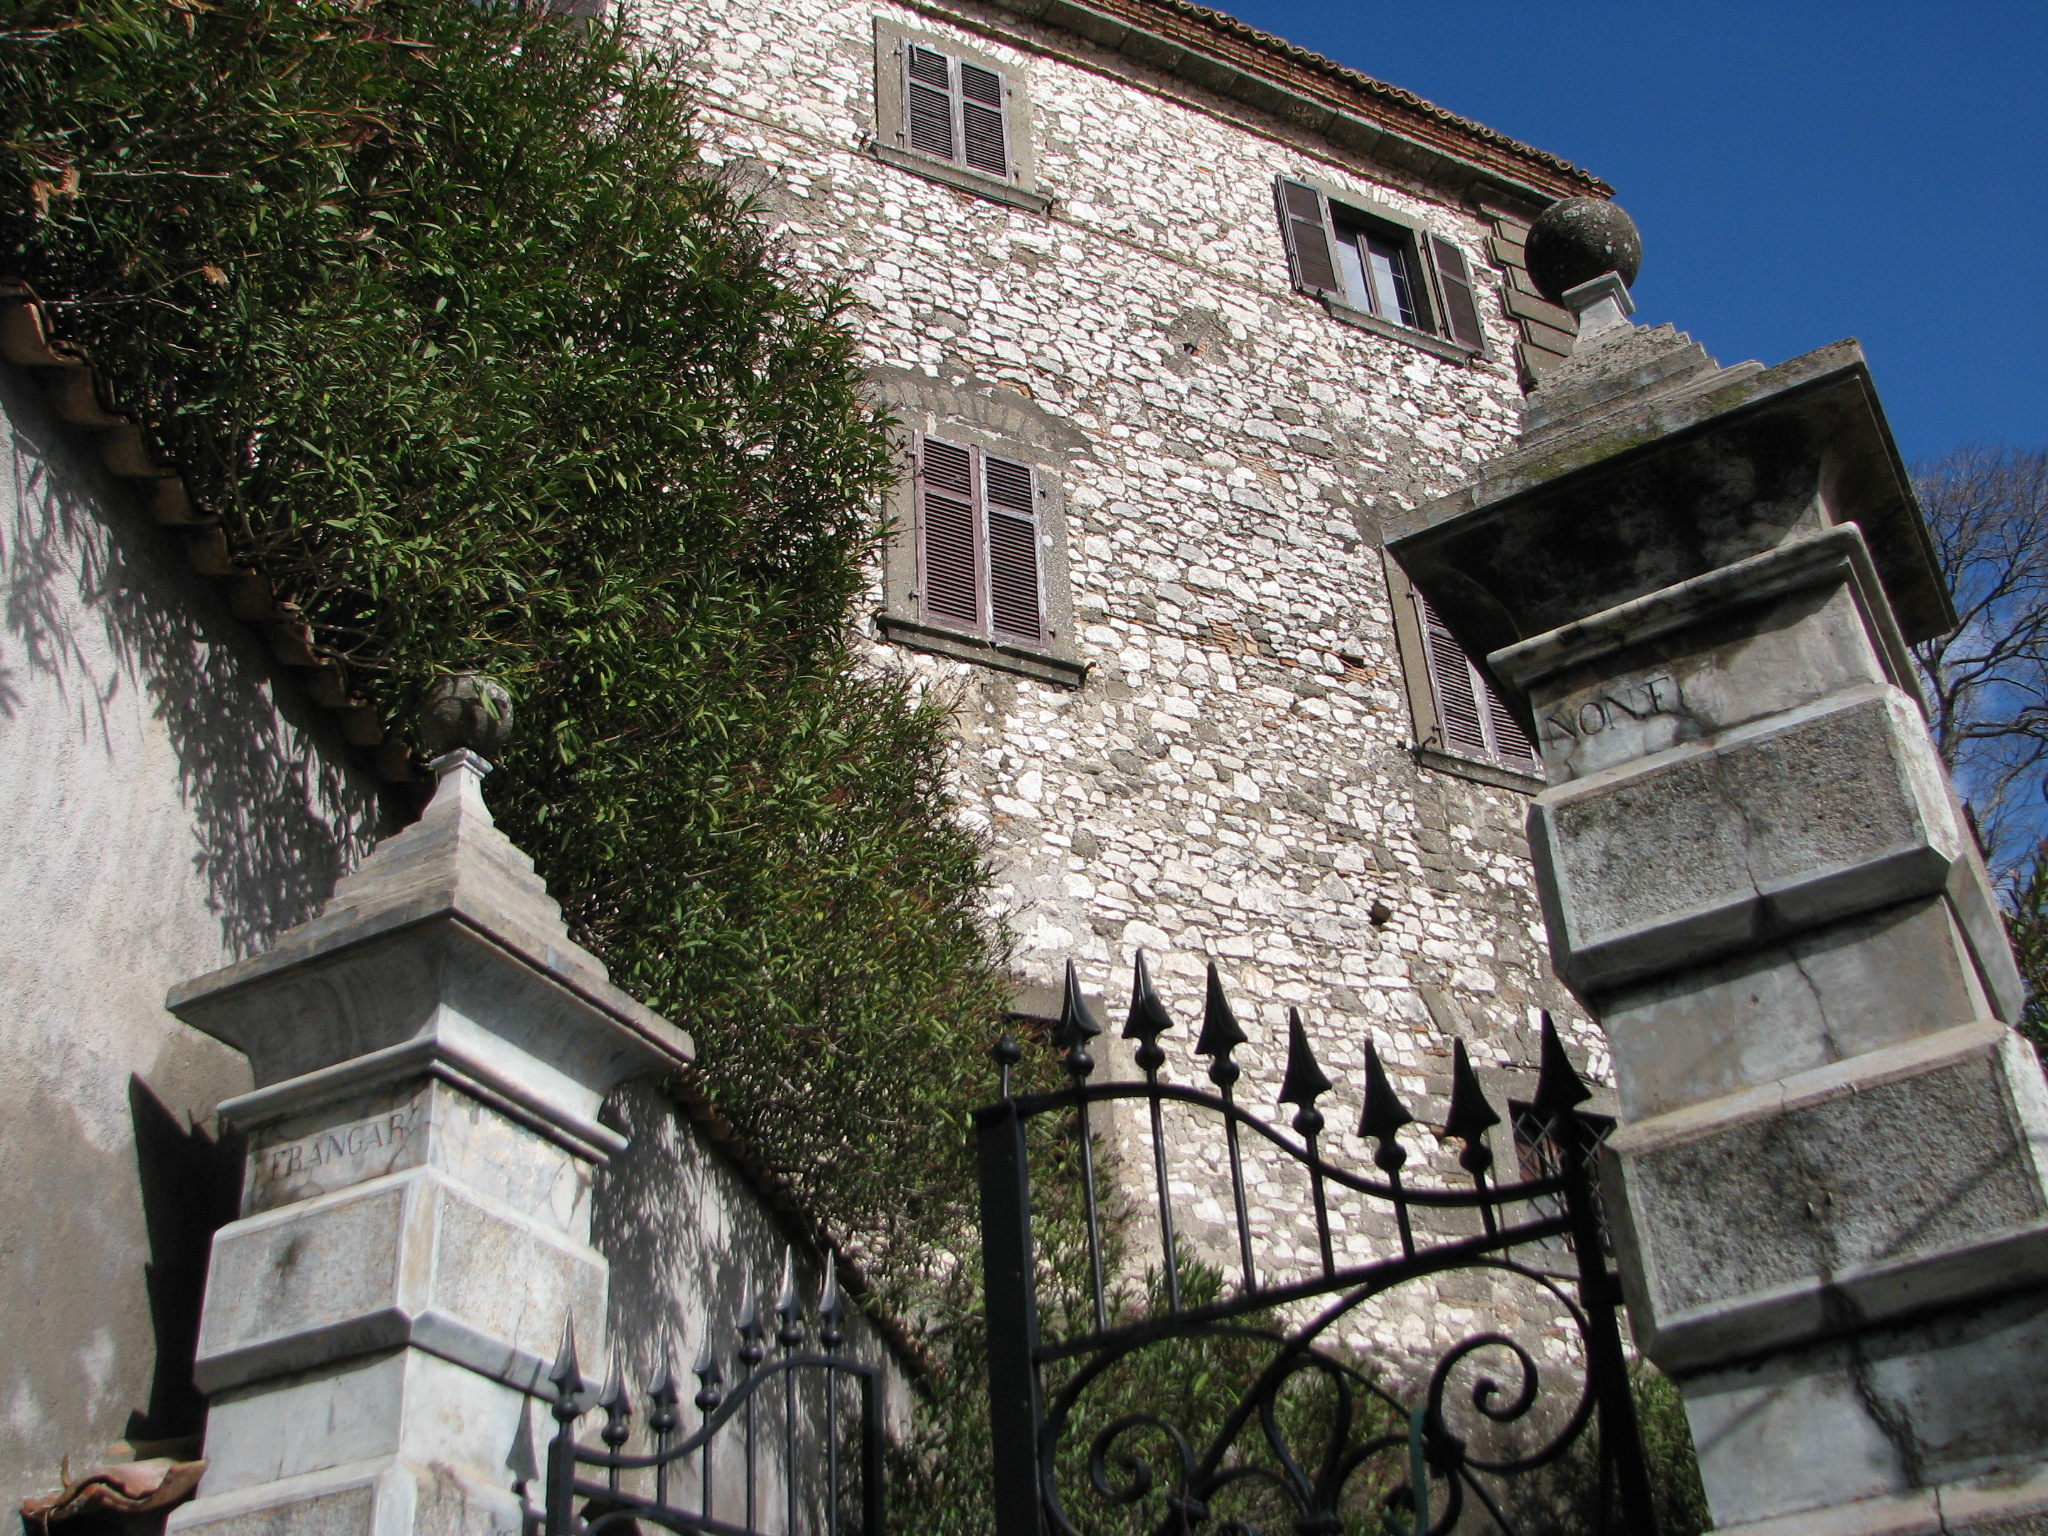 39 Ingresso palazzo Spezza